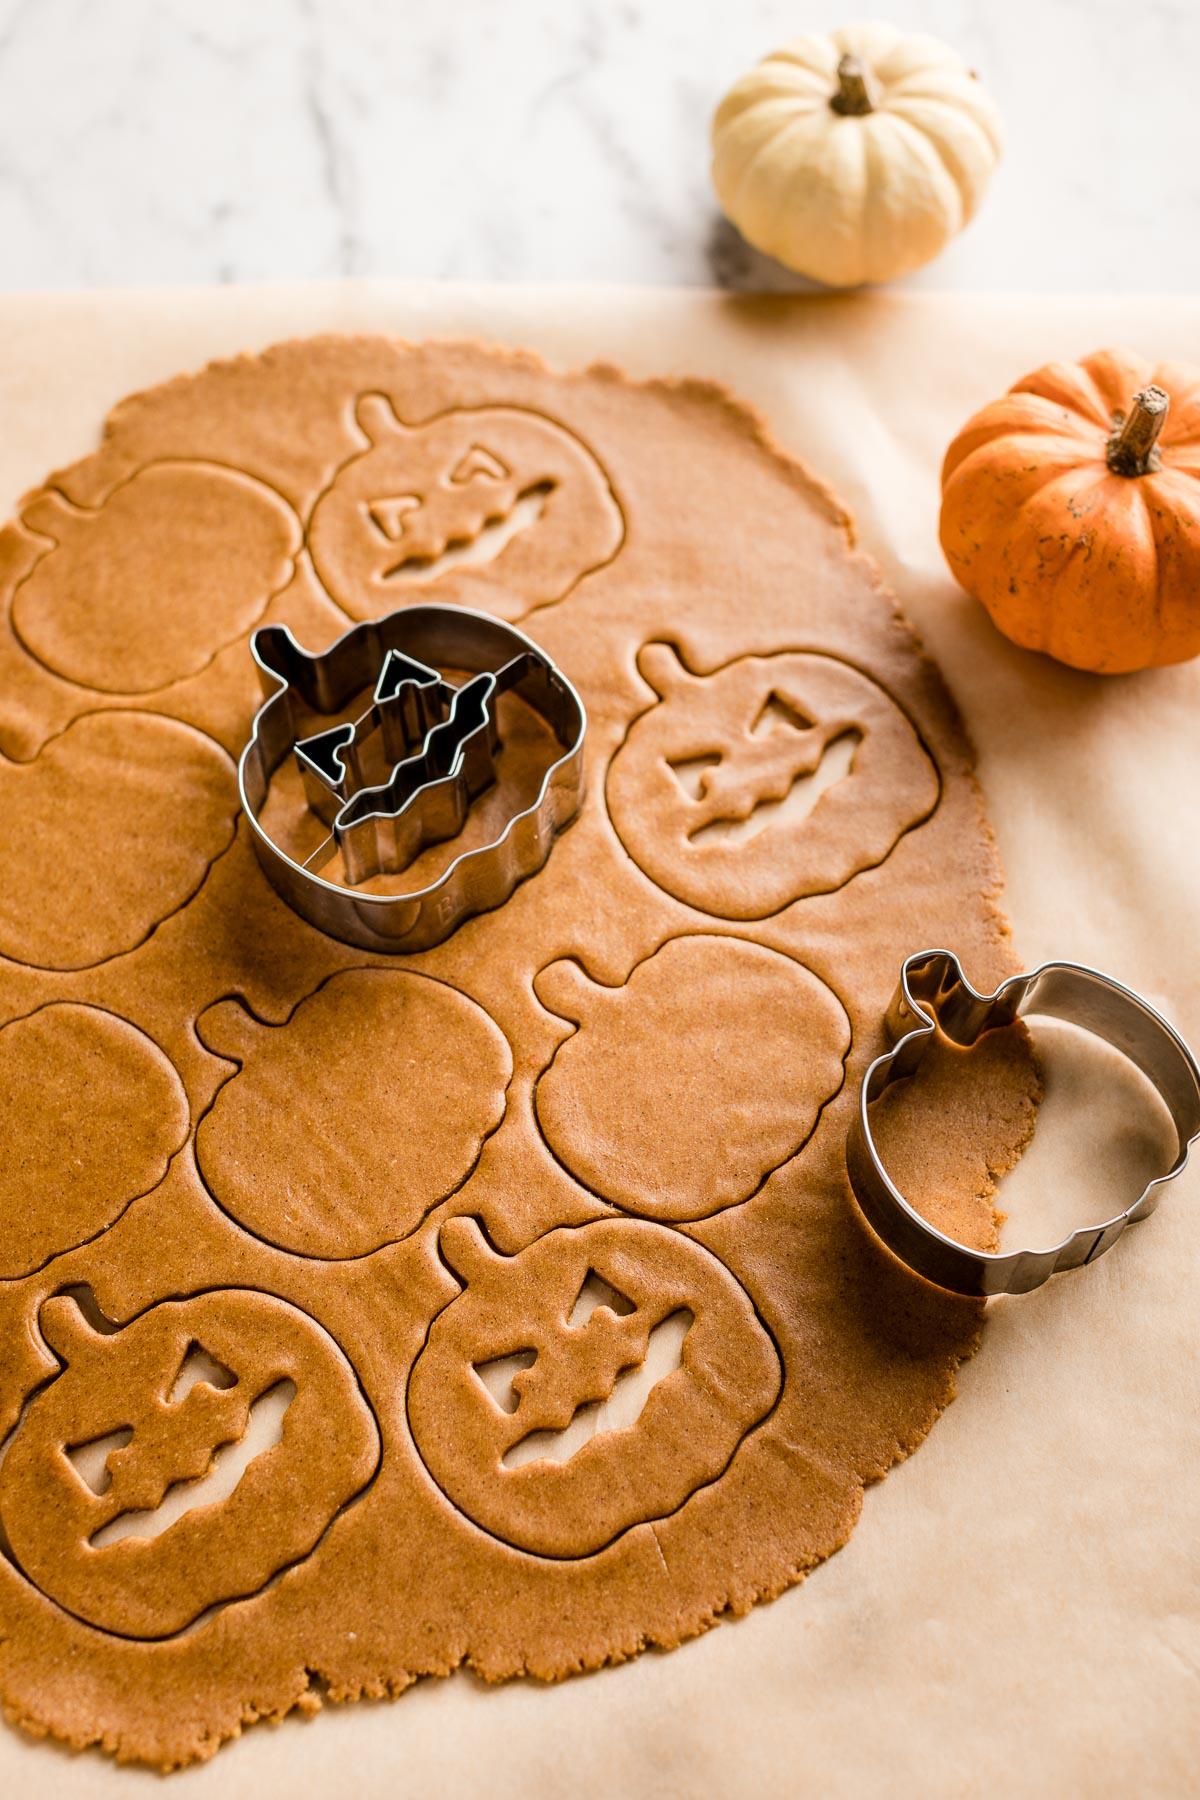 ricetta biscotti alla zucca vegan integrali senza uova senza burro vegan pumpkin cutout cookies recipe Halloween cookies